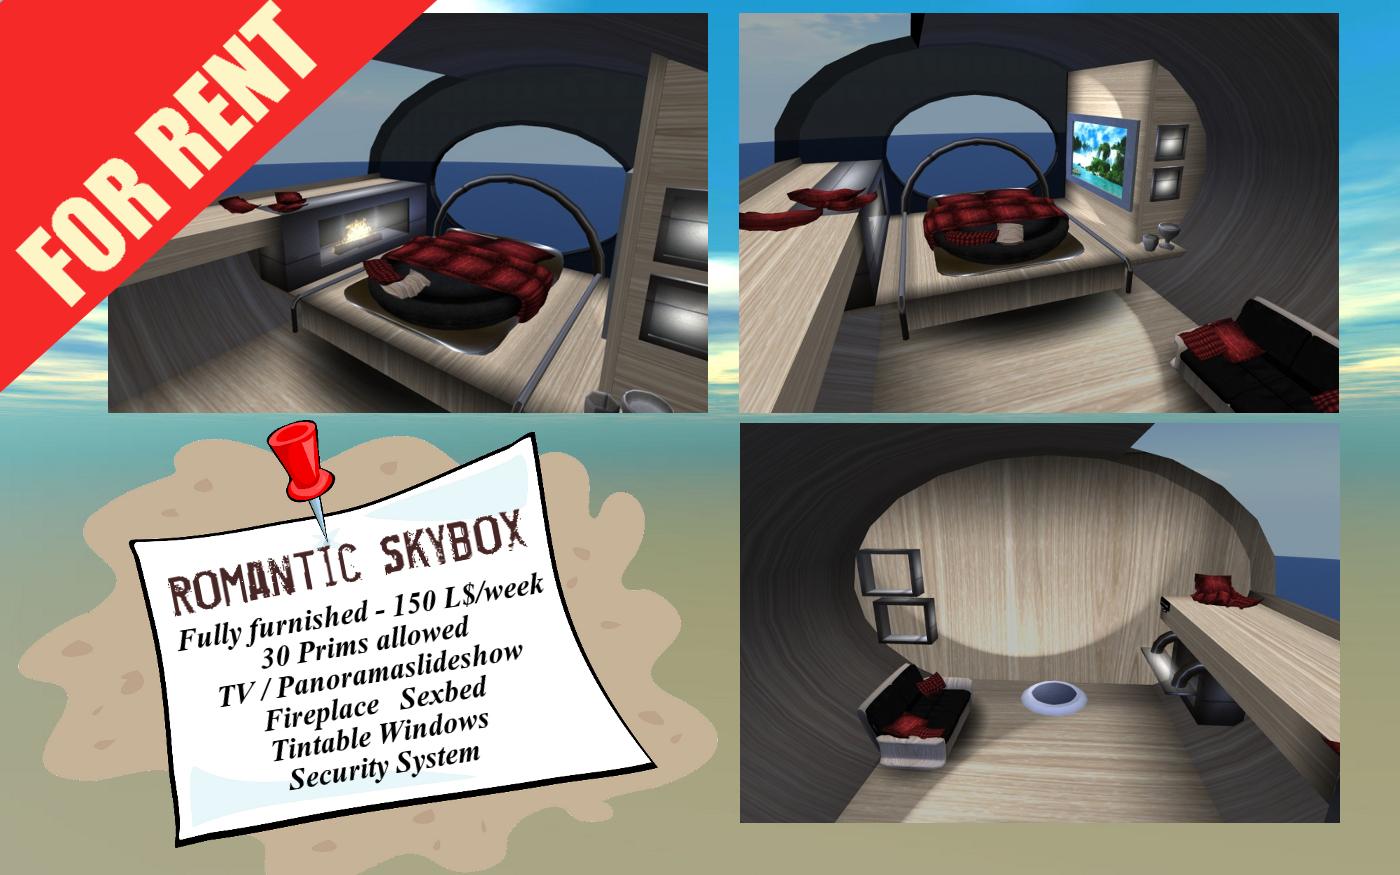 vendorpic-skybox